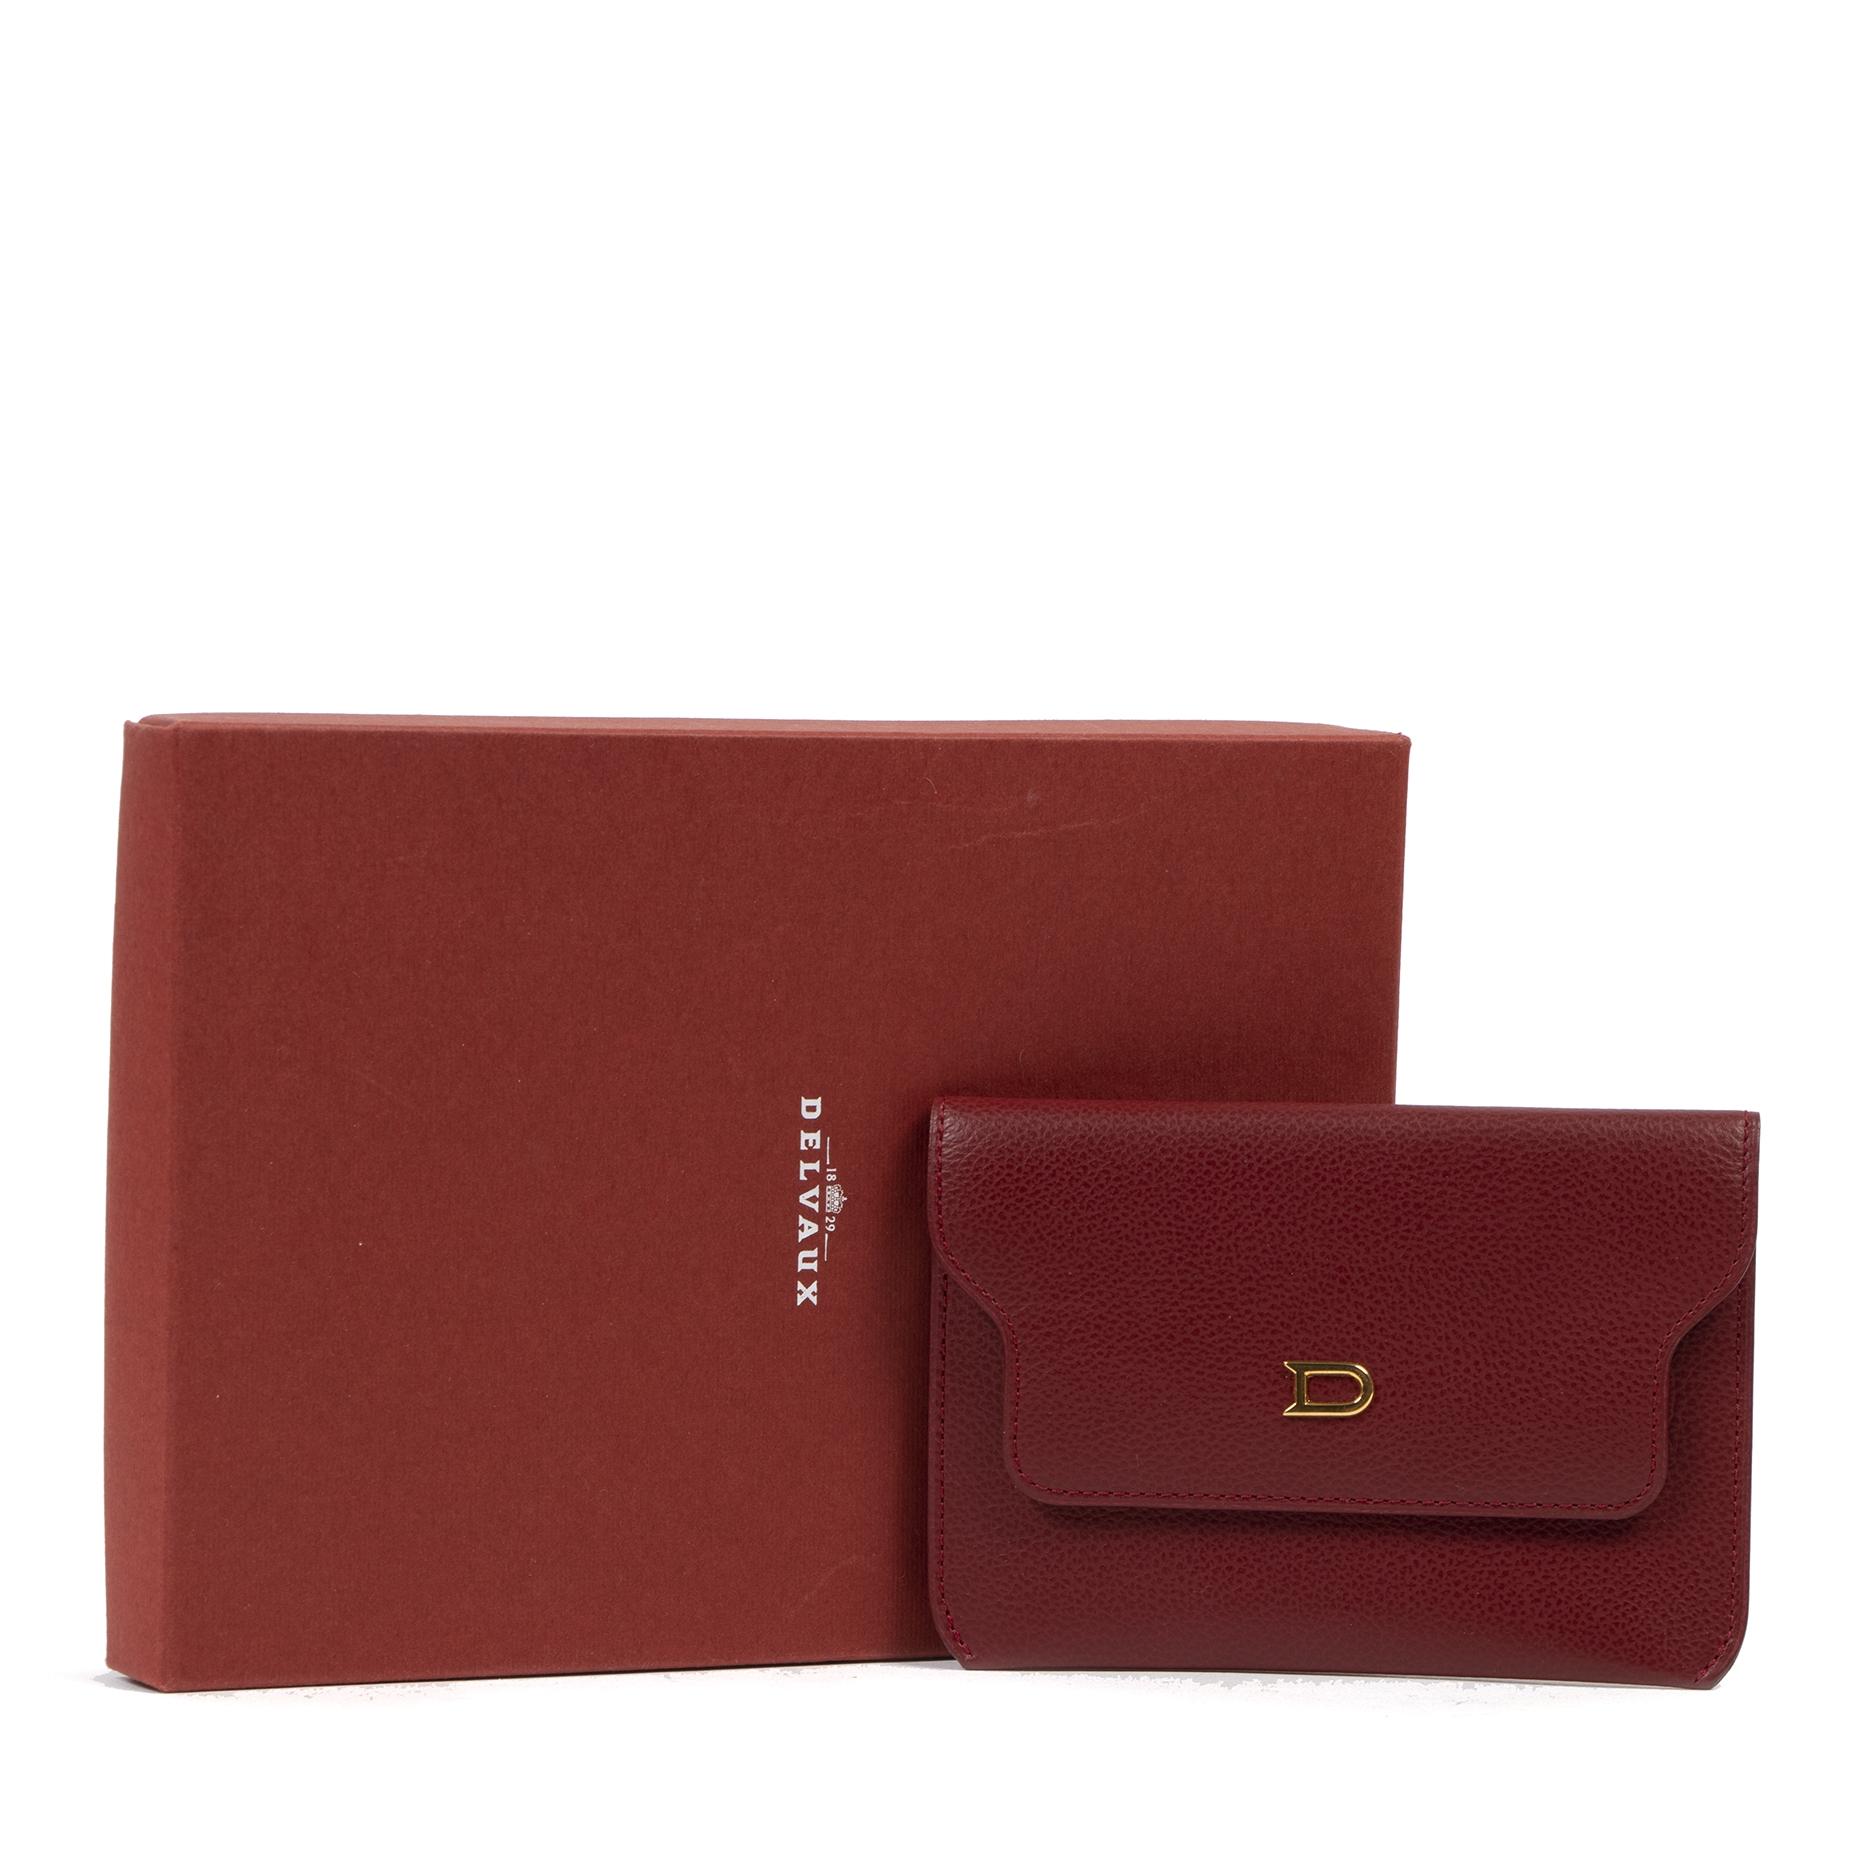 Authentieke tweedehands vintage Delvaux Burgundy Wallet koop online webshop LabelLOV